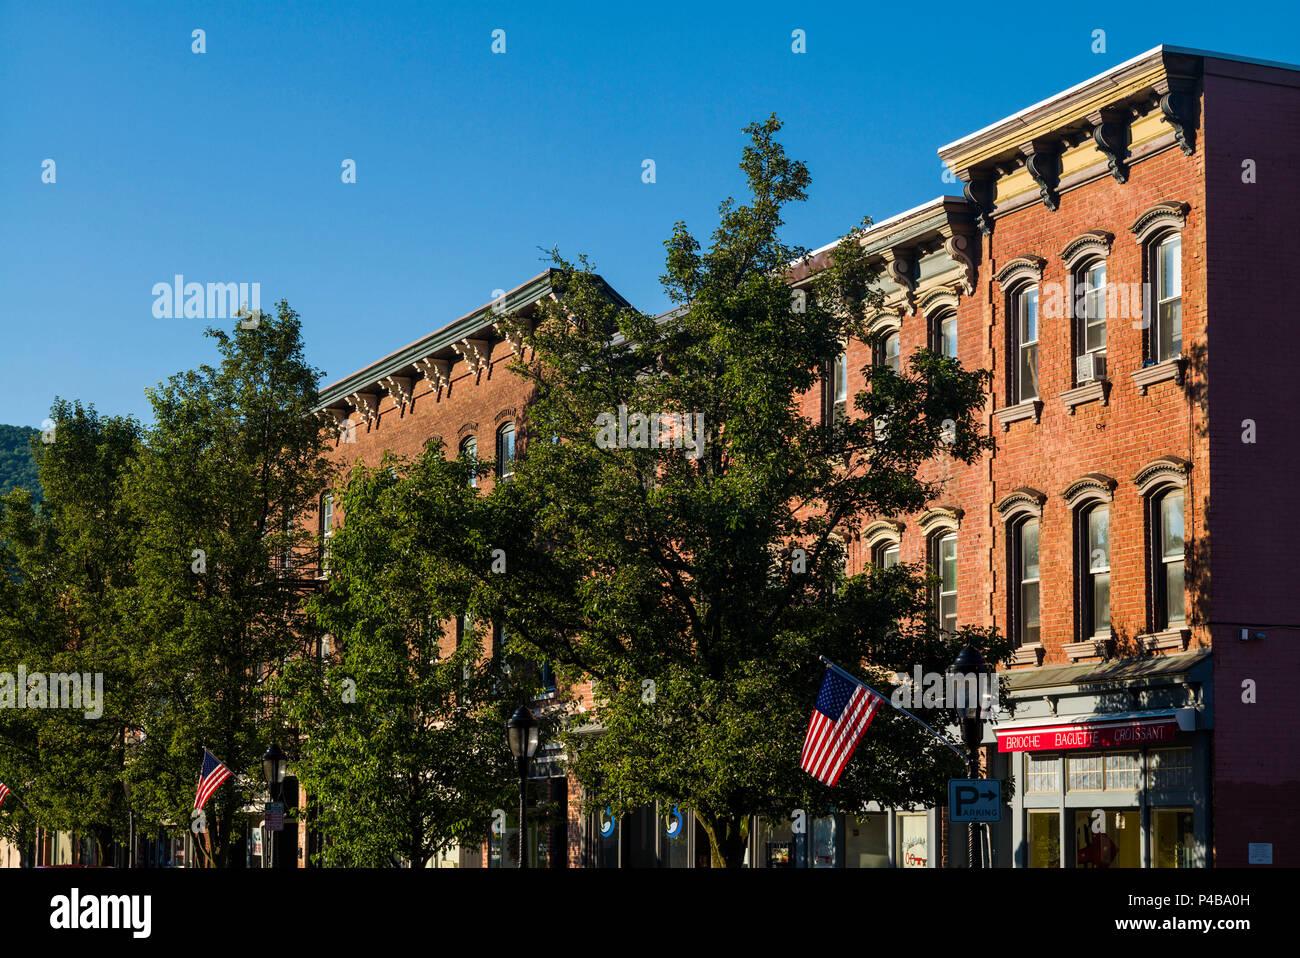 USA, New York, Hudson Valley Region, Beacon, downtown buidings - Stock Image